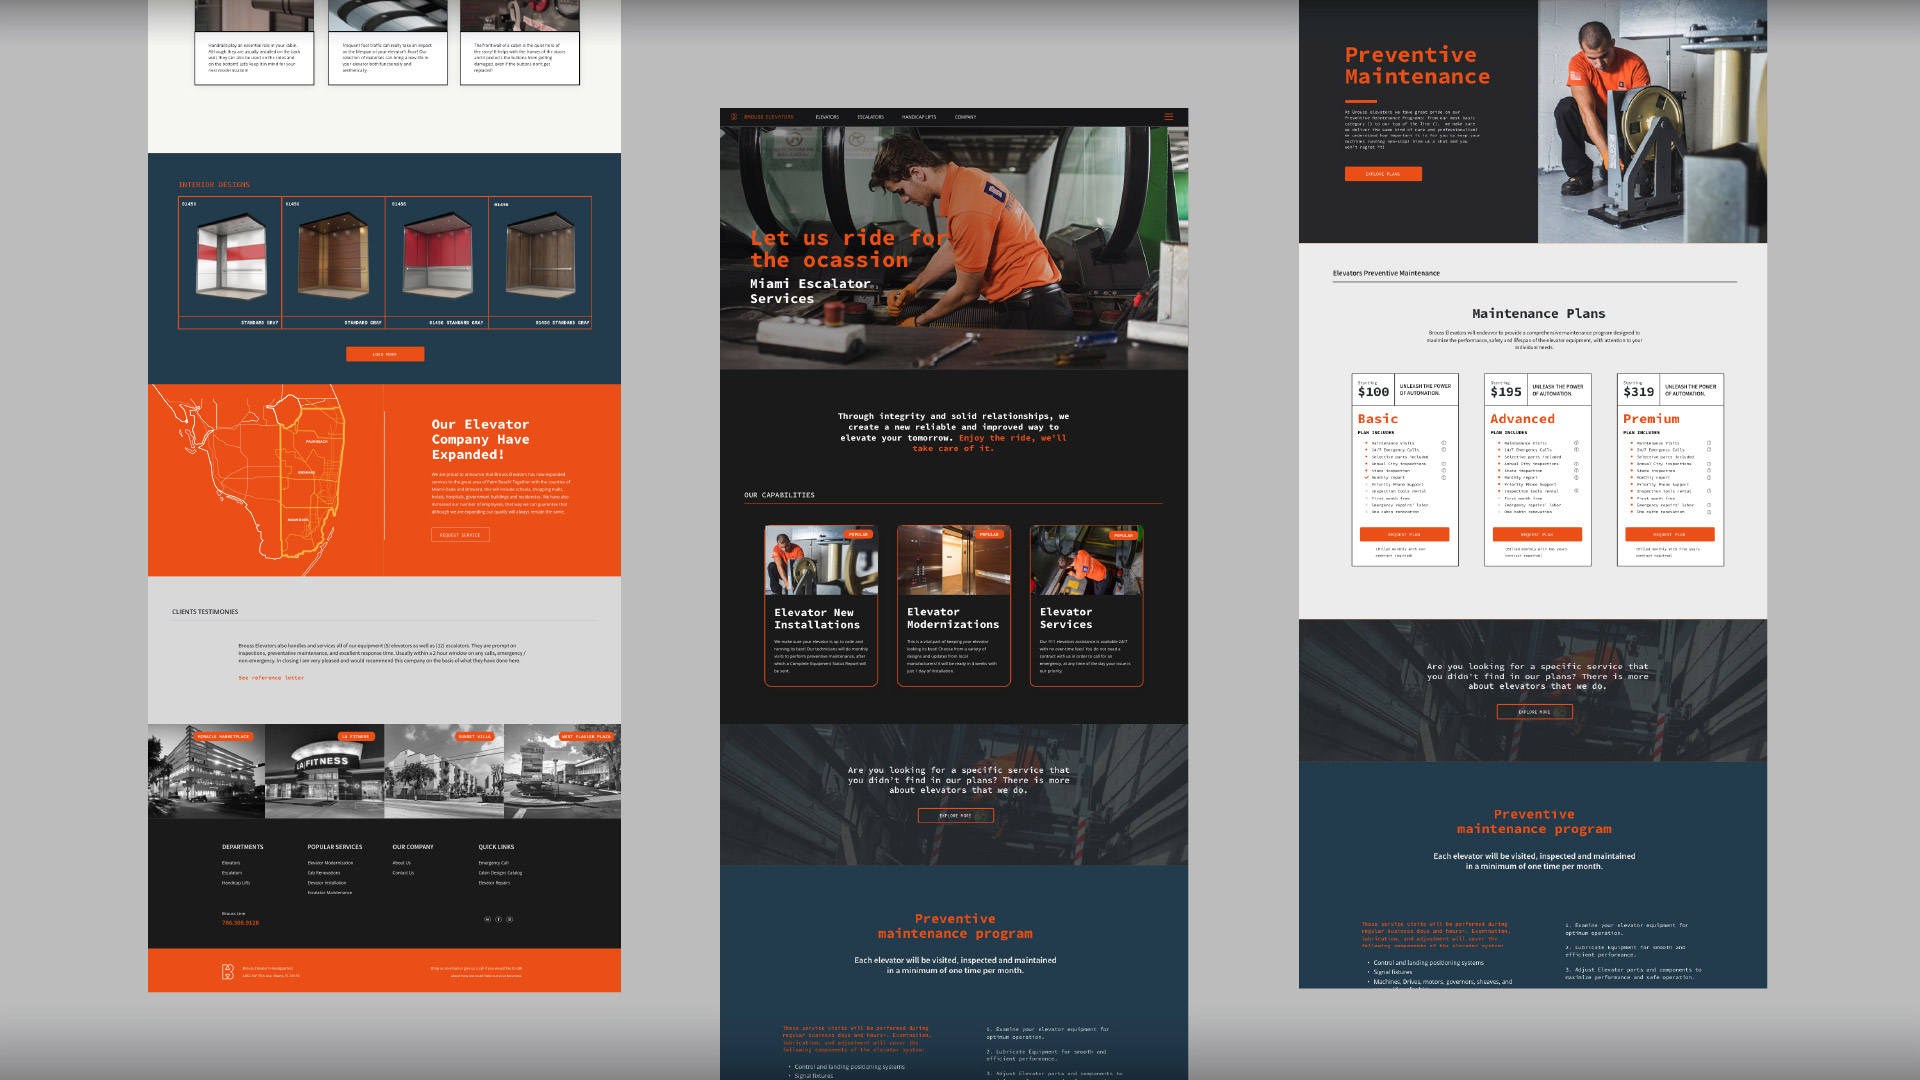 Brouss Elevators website development desktop version by Kinetik Lab